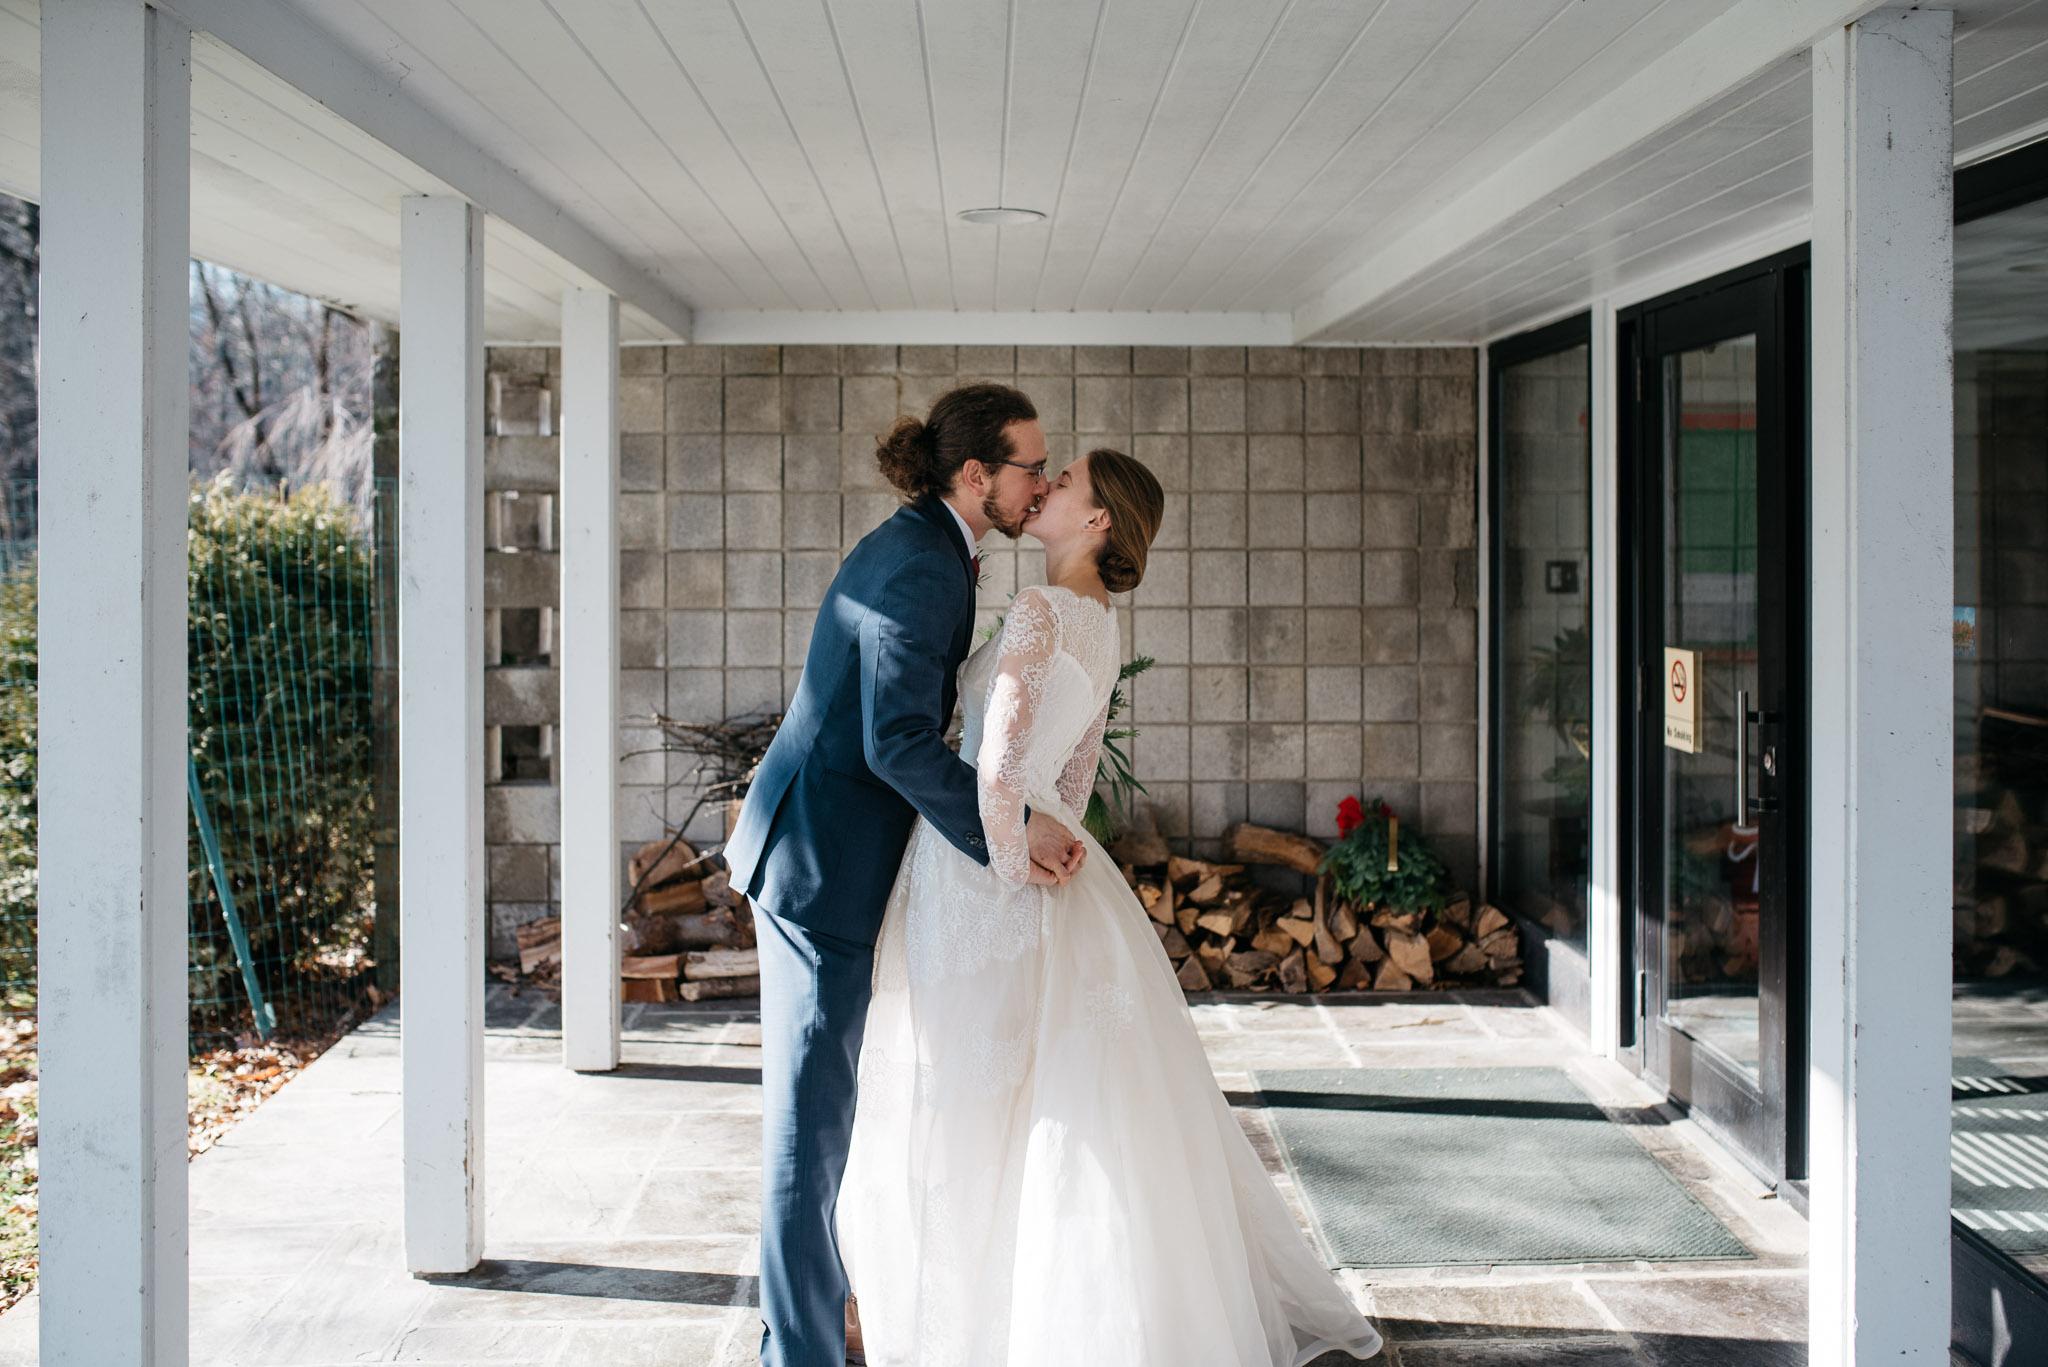 St Michaels Church wedding ceremony, Ligonier Wedding Photographer-6465.jpg